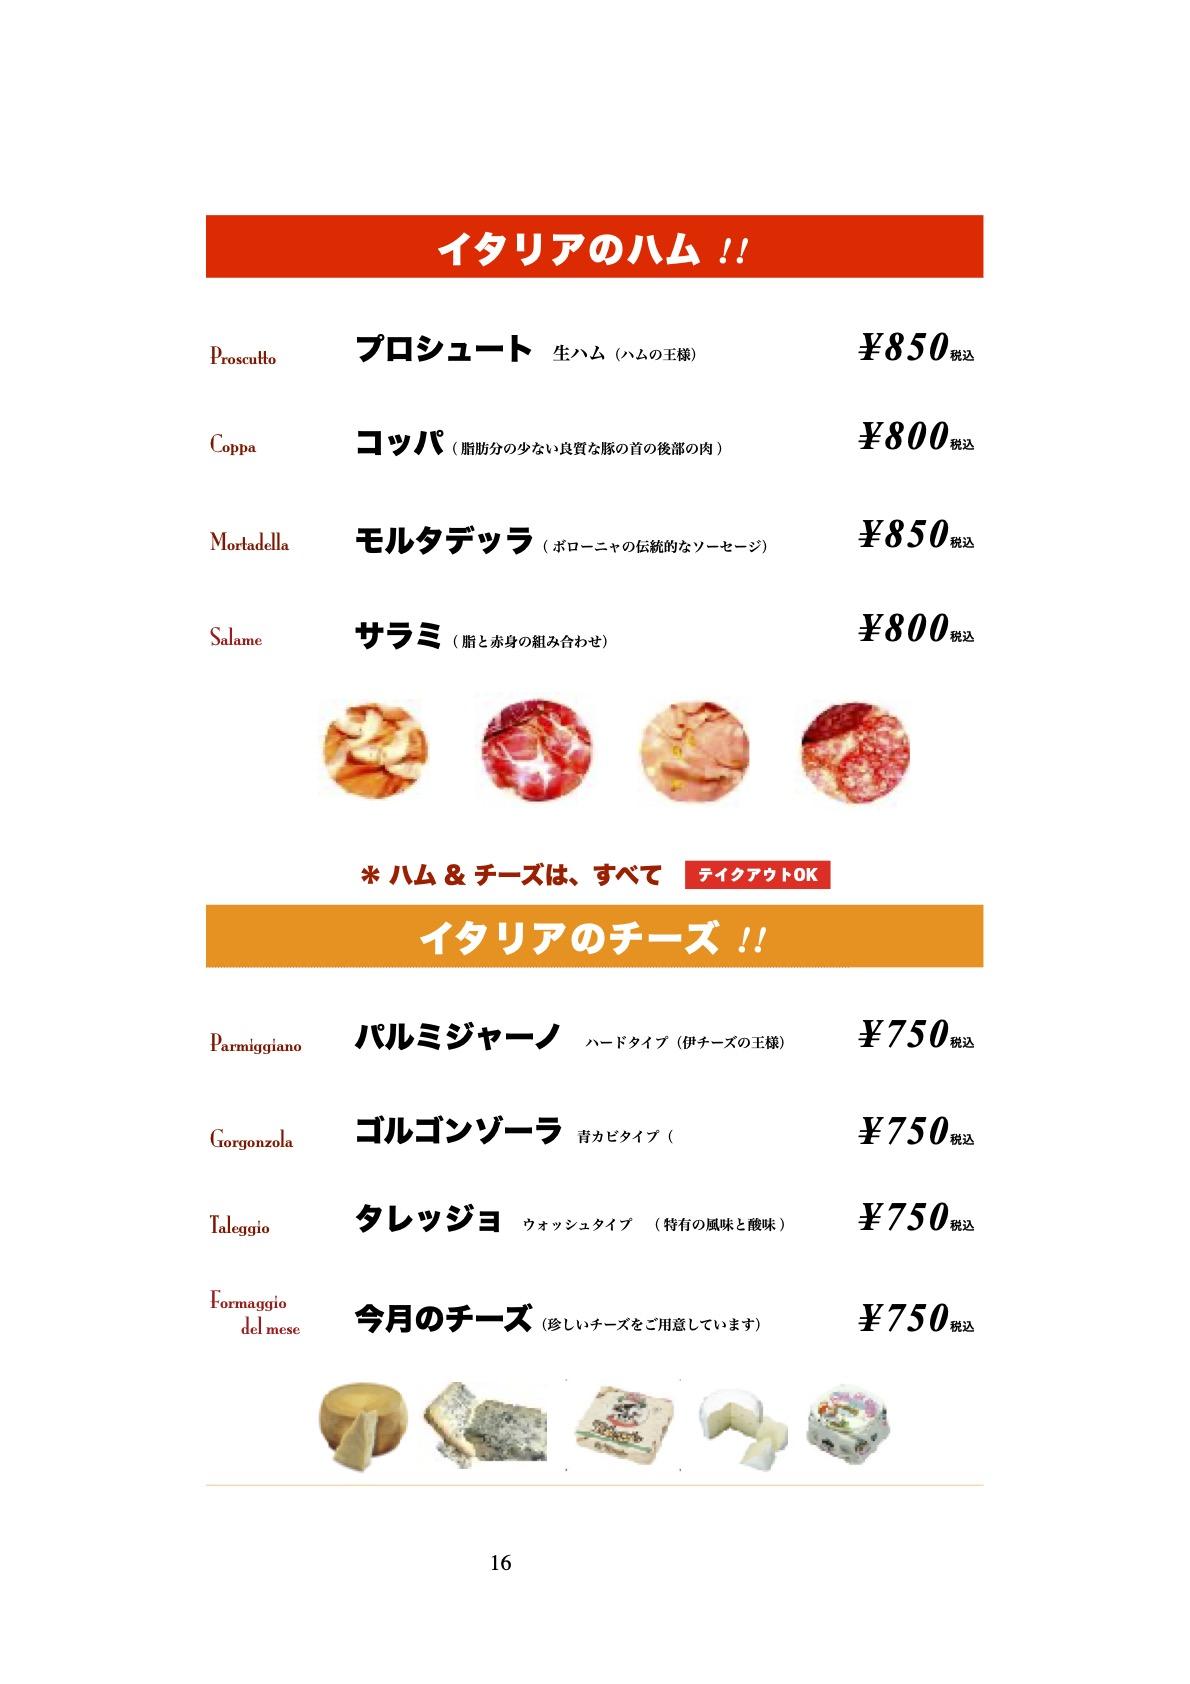 2021_3_hakataグランドメニュー税込_ハム&チーズ.jpg